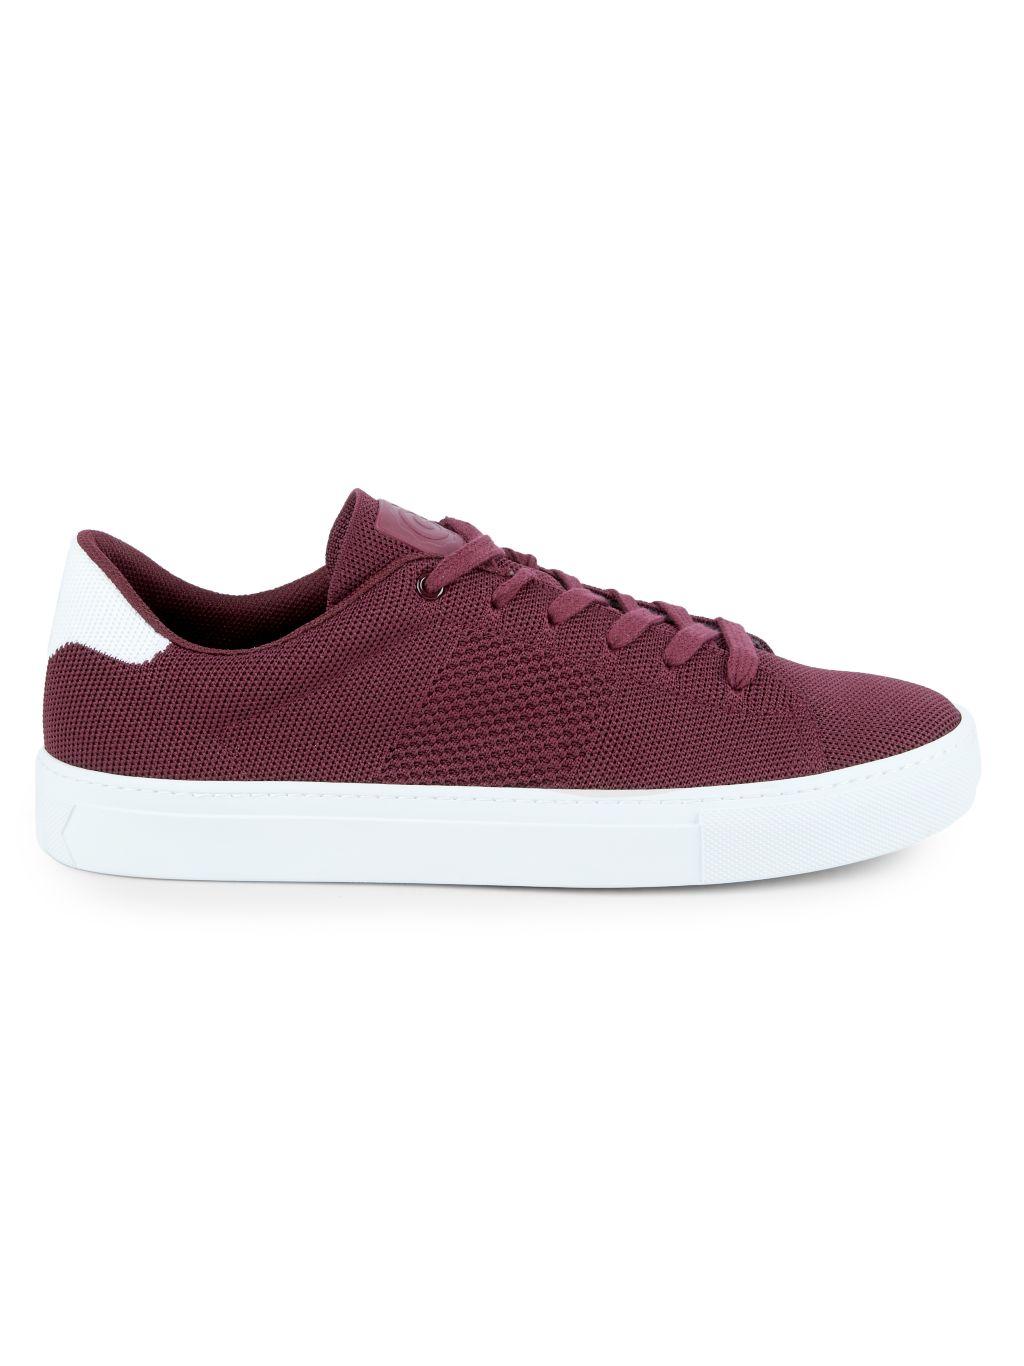 GREATS Royale Enviroknit Sneakers